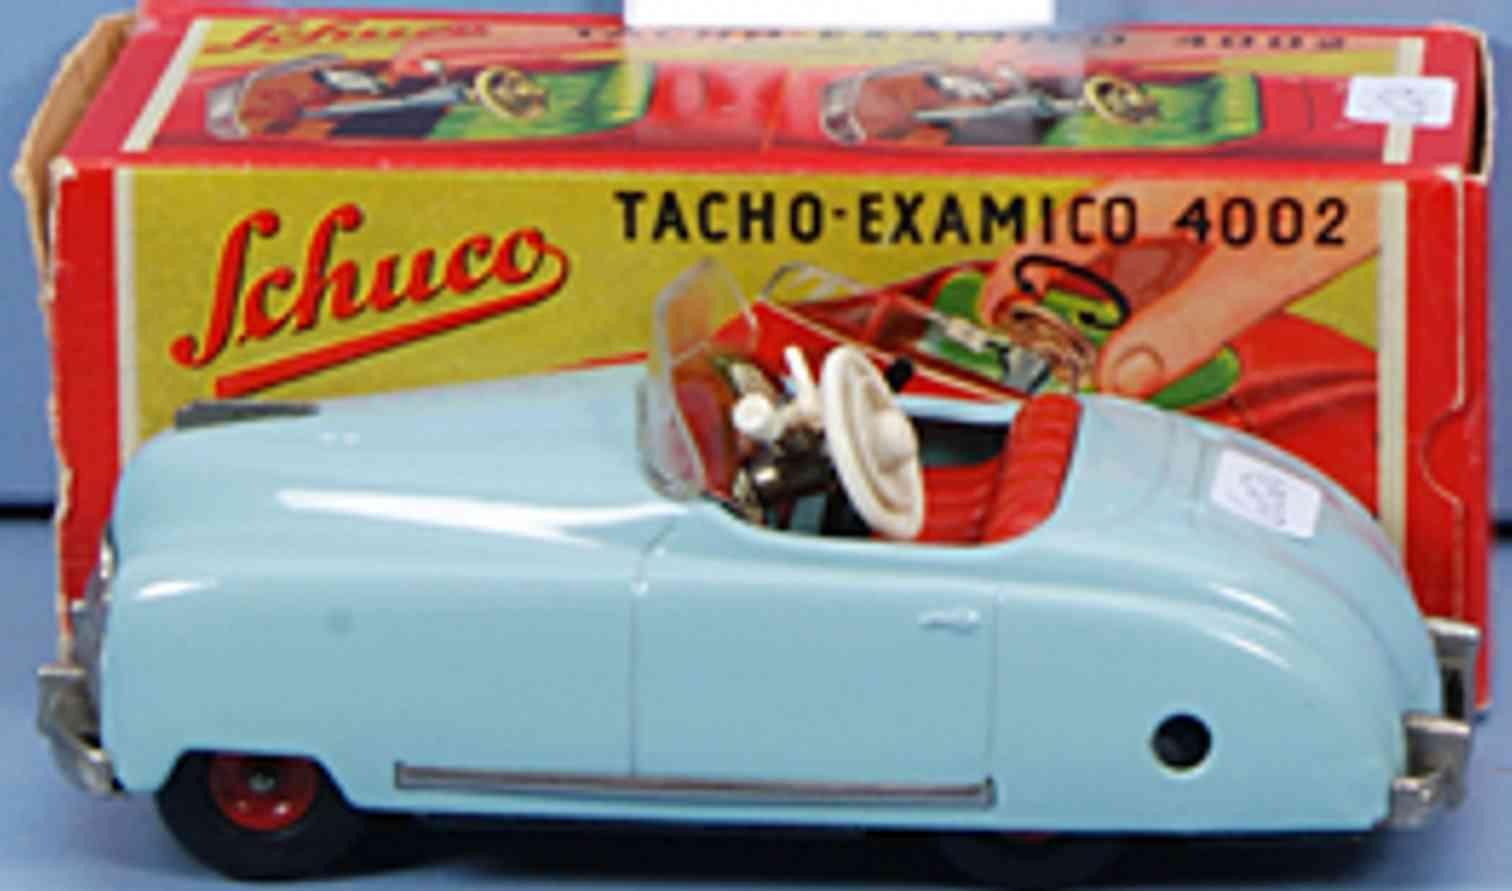 schuco 4002 tin toy car tacho examico light blue